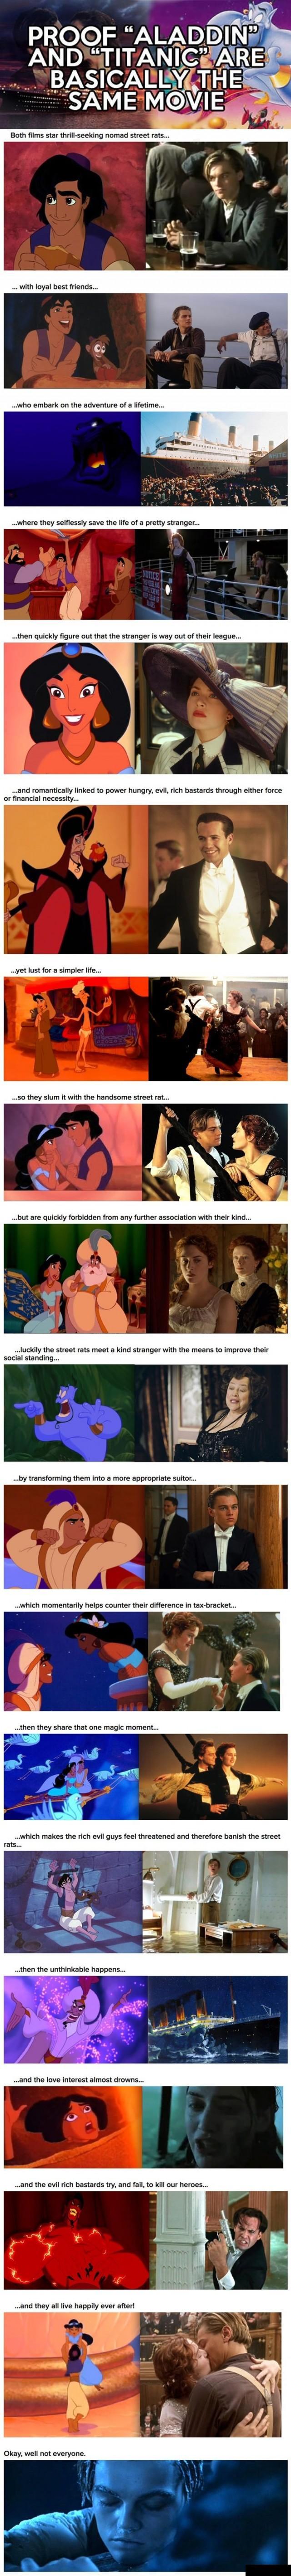 Proof Aladdin And Titanic Are Basically The Same Movie!